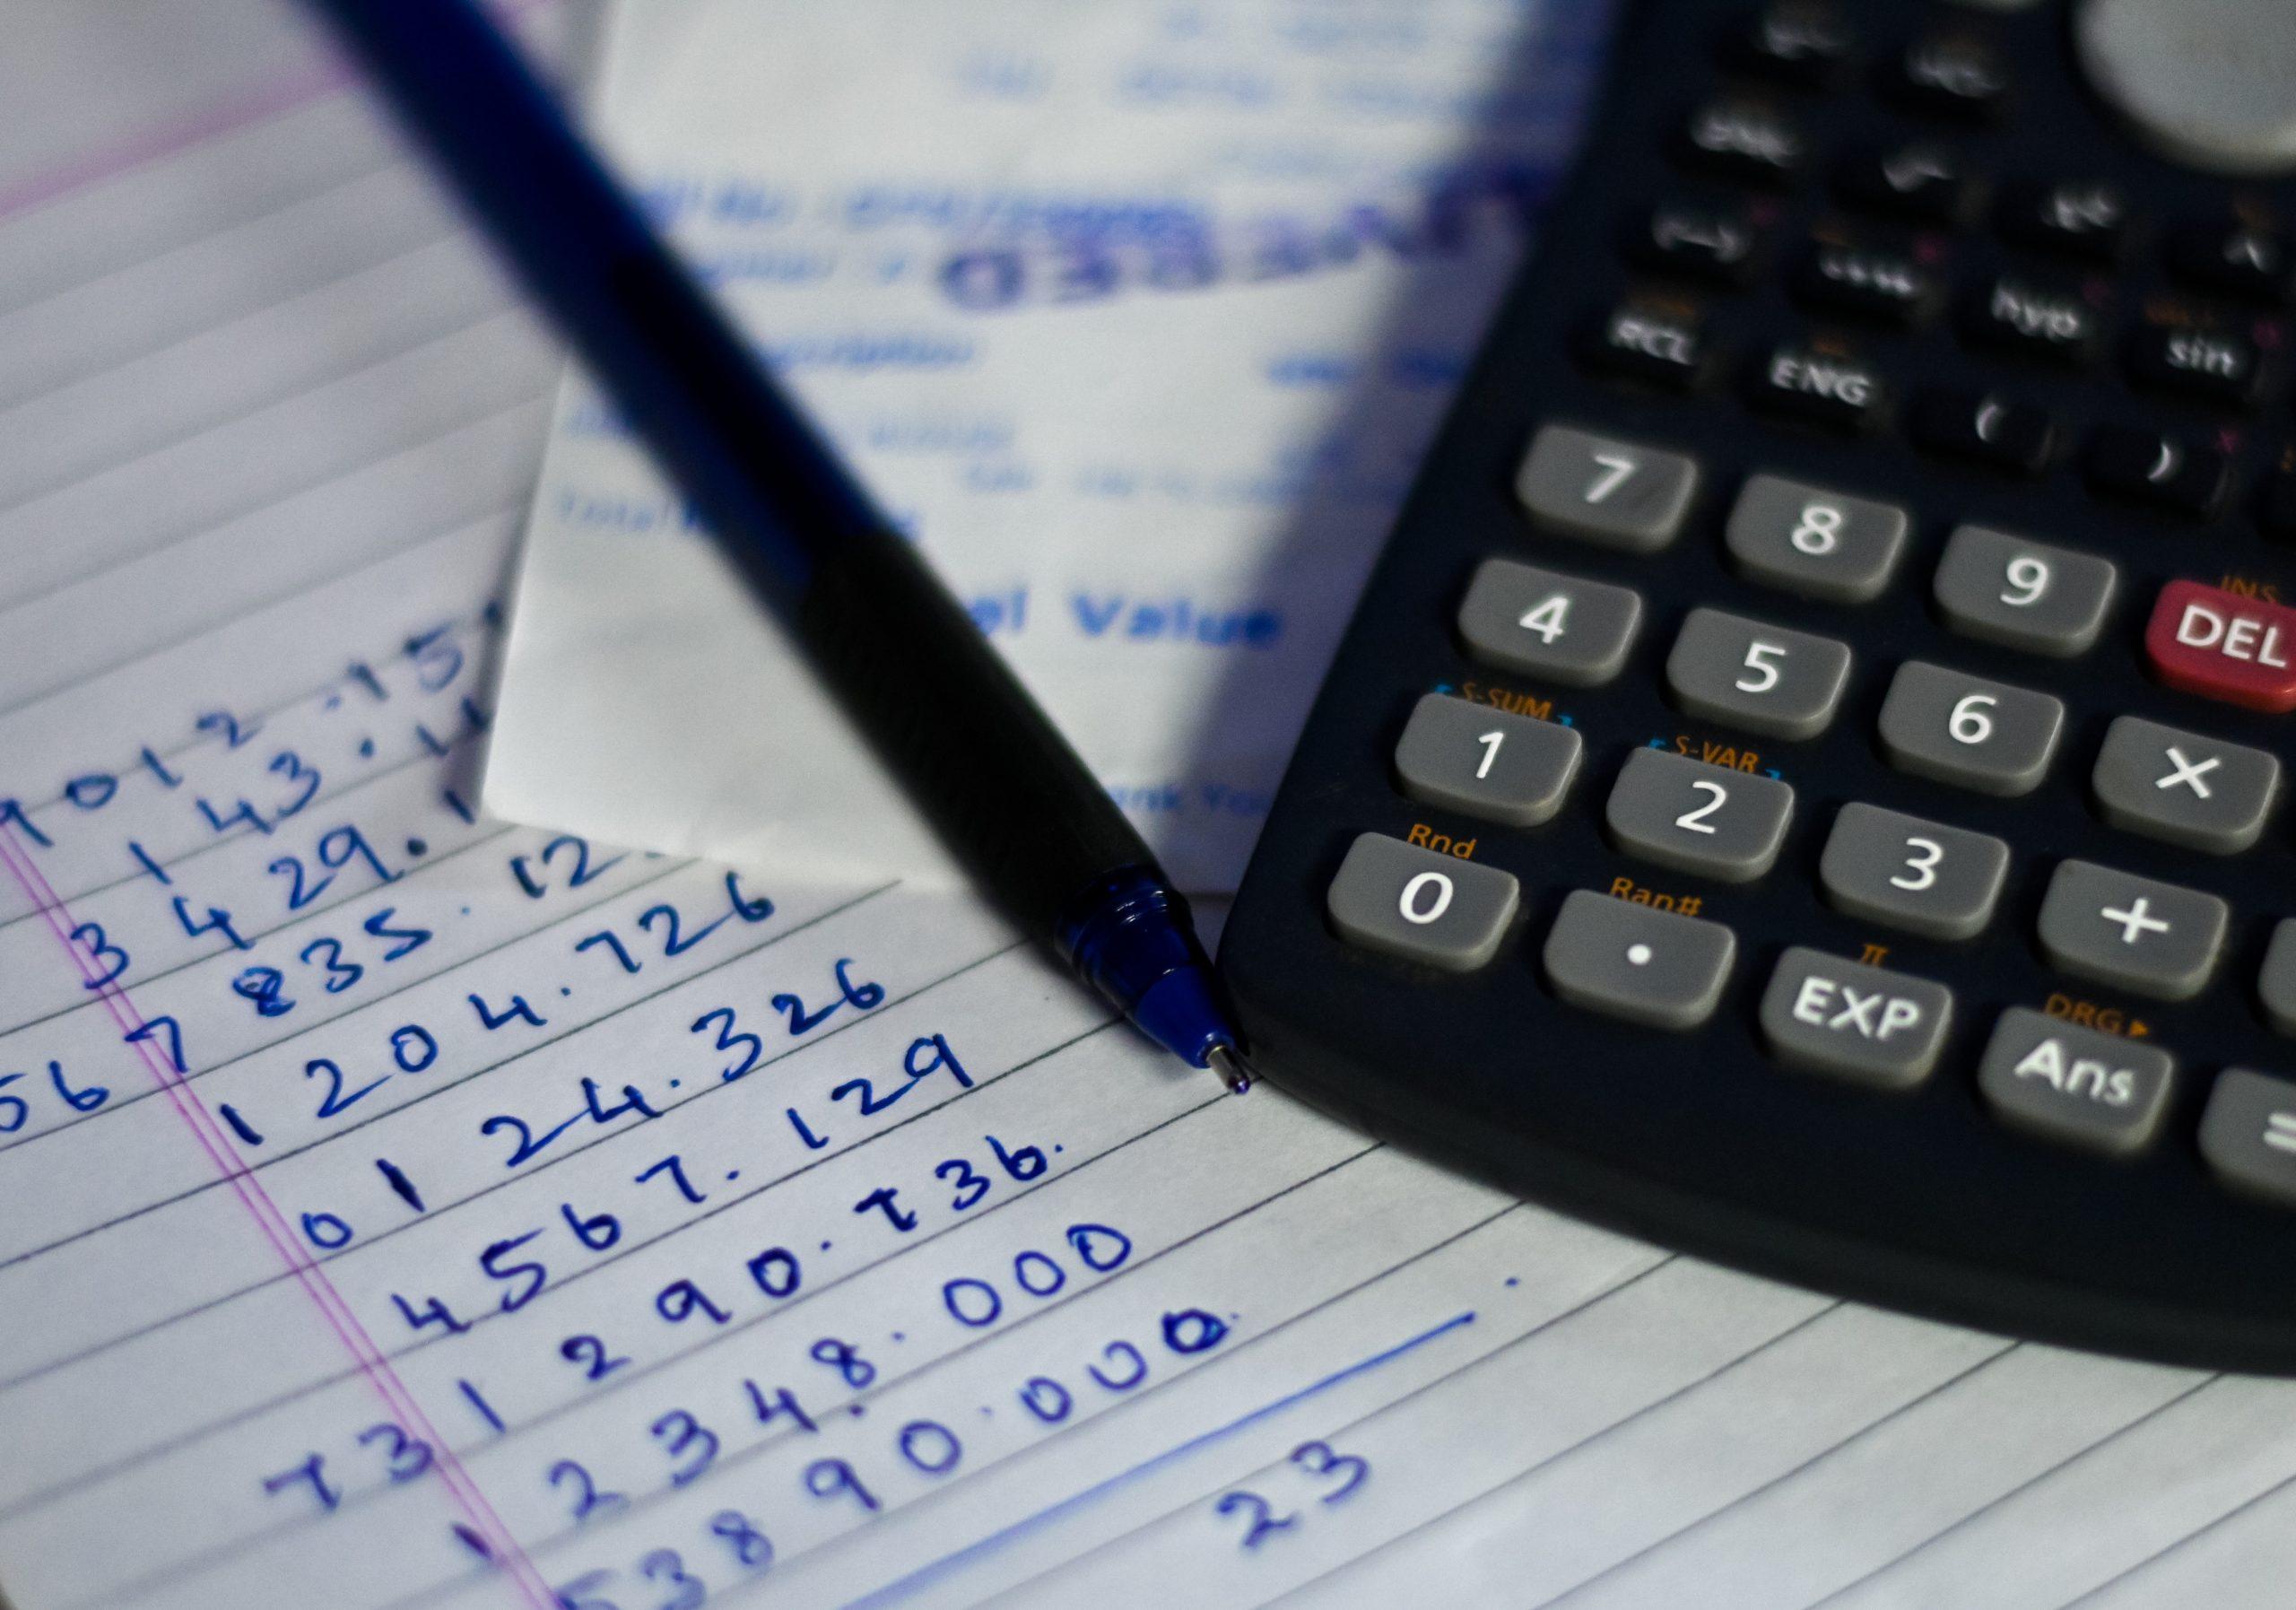 A scientific calculator